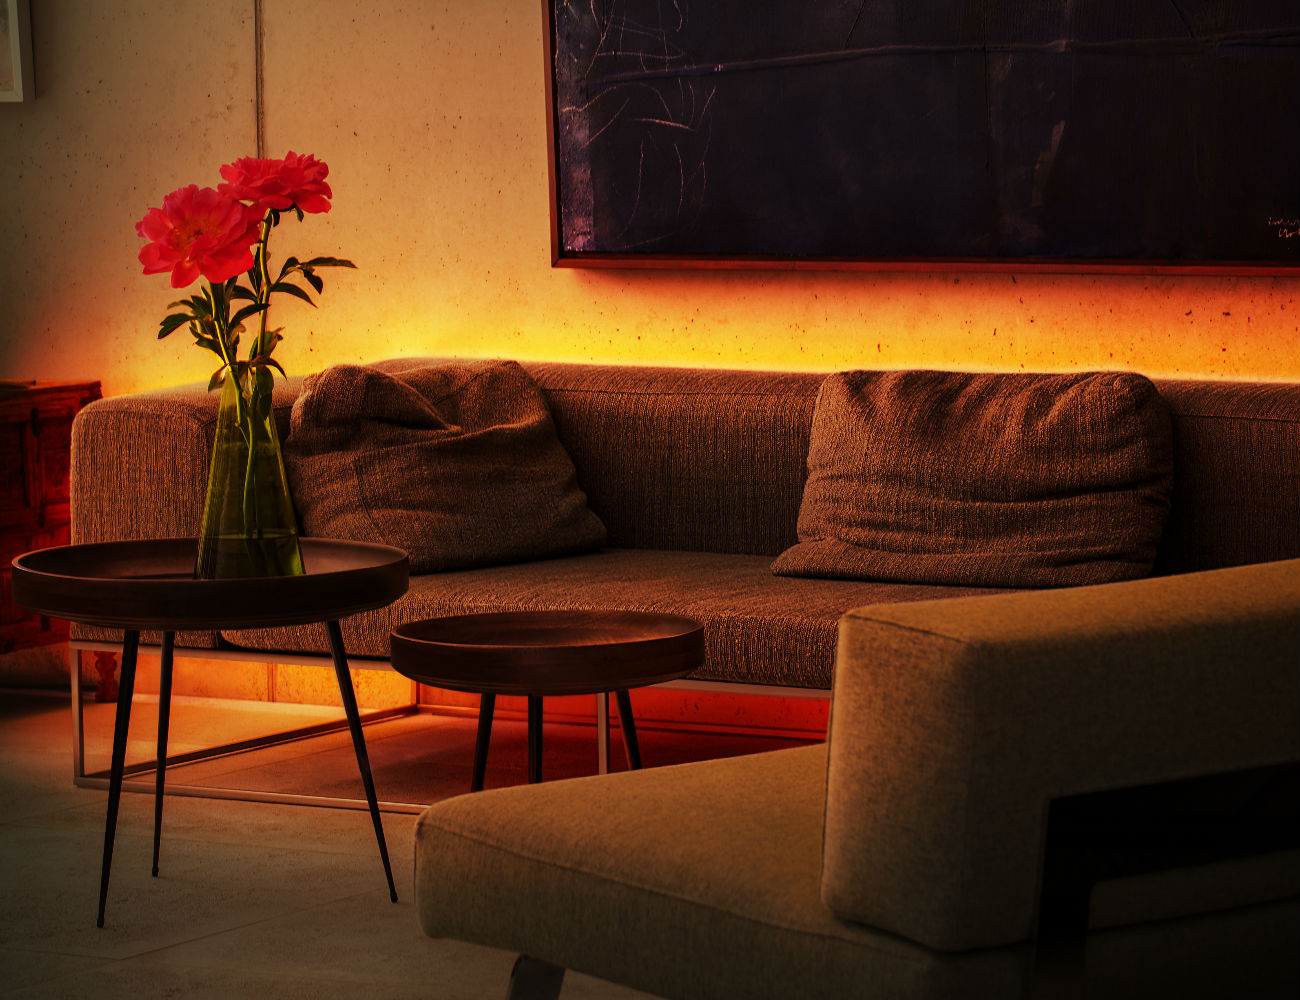 Eve Smart LED Light Strip